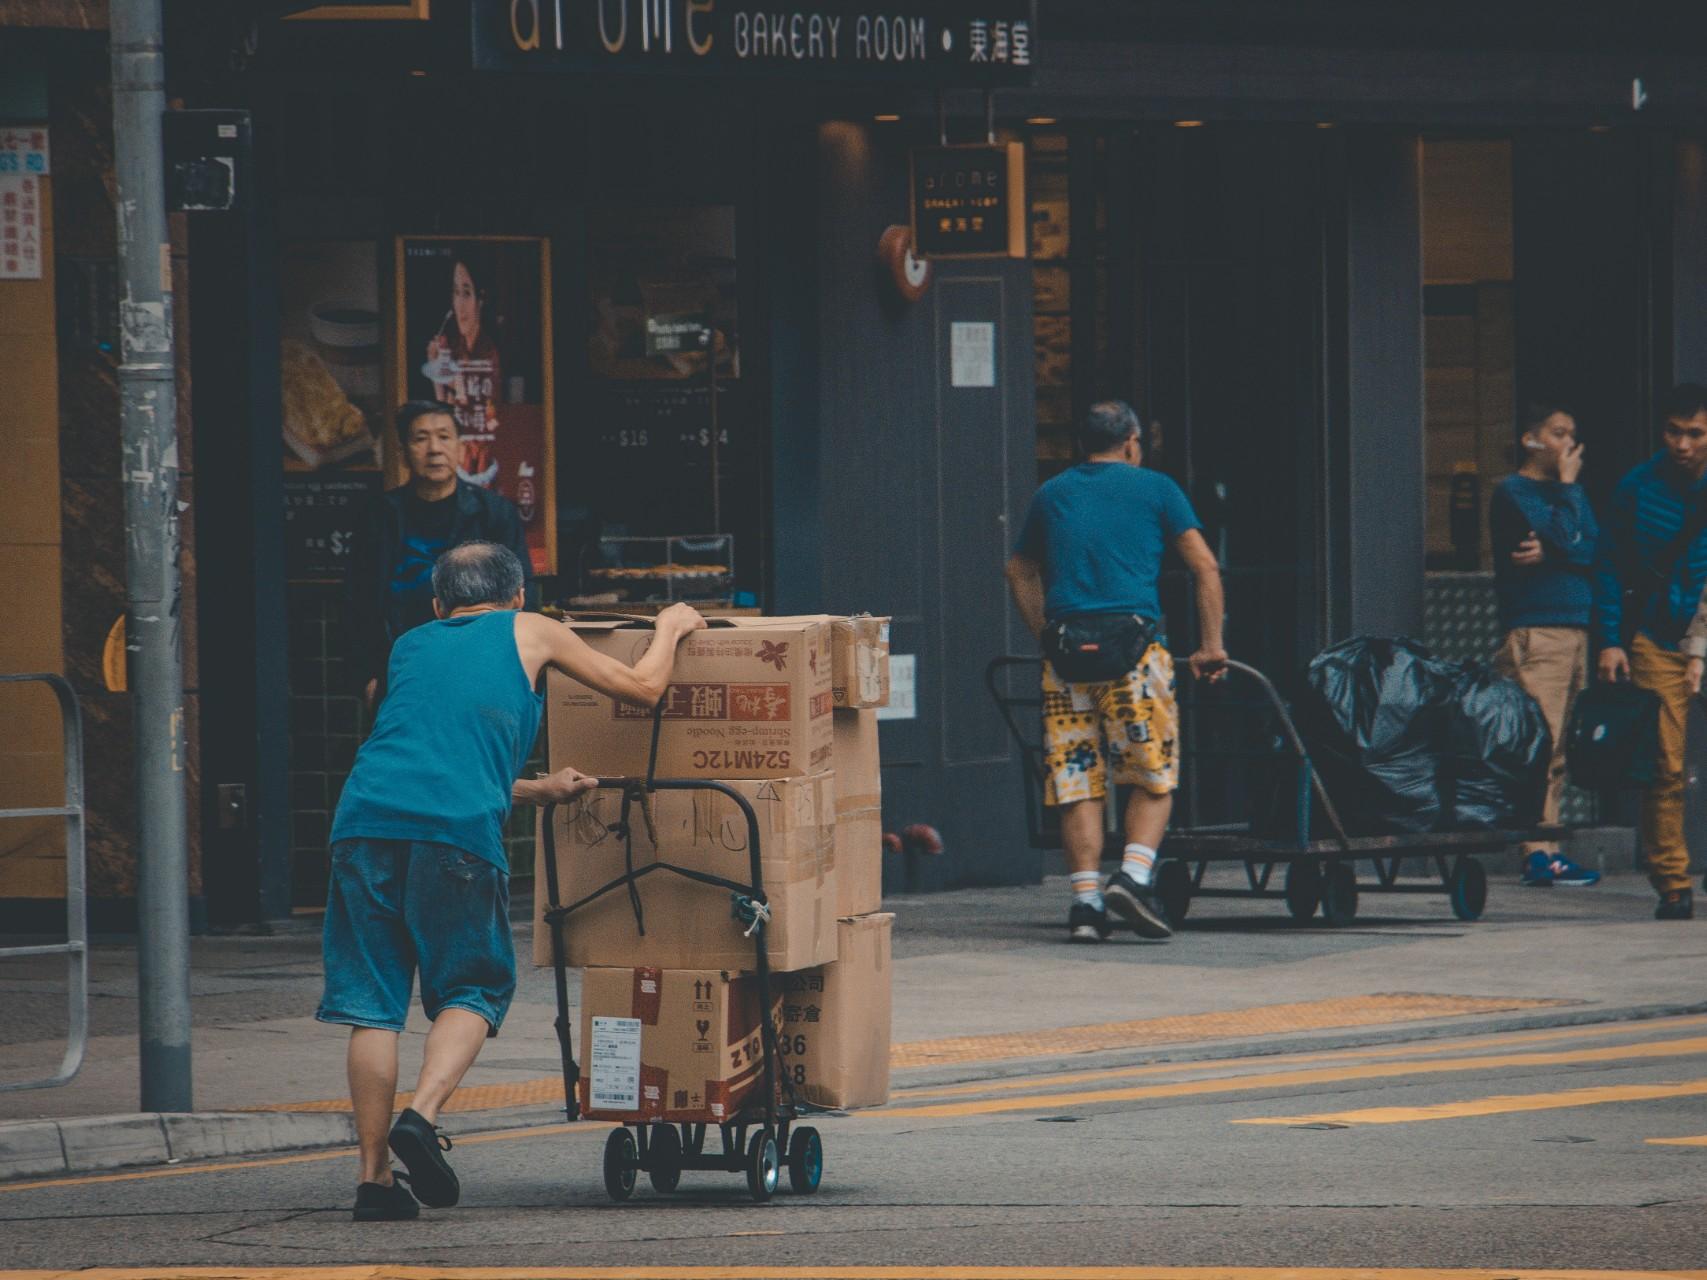 A man delivering boxes. Image Credit: Thomas Chan/Unsplash